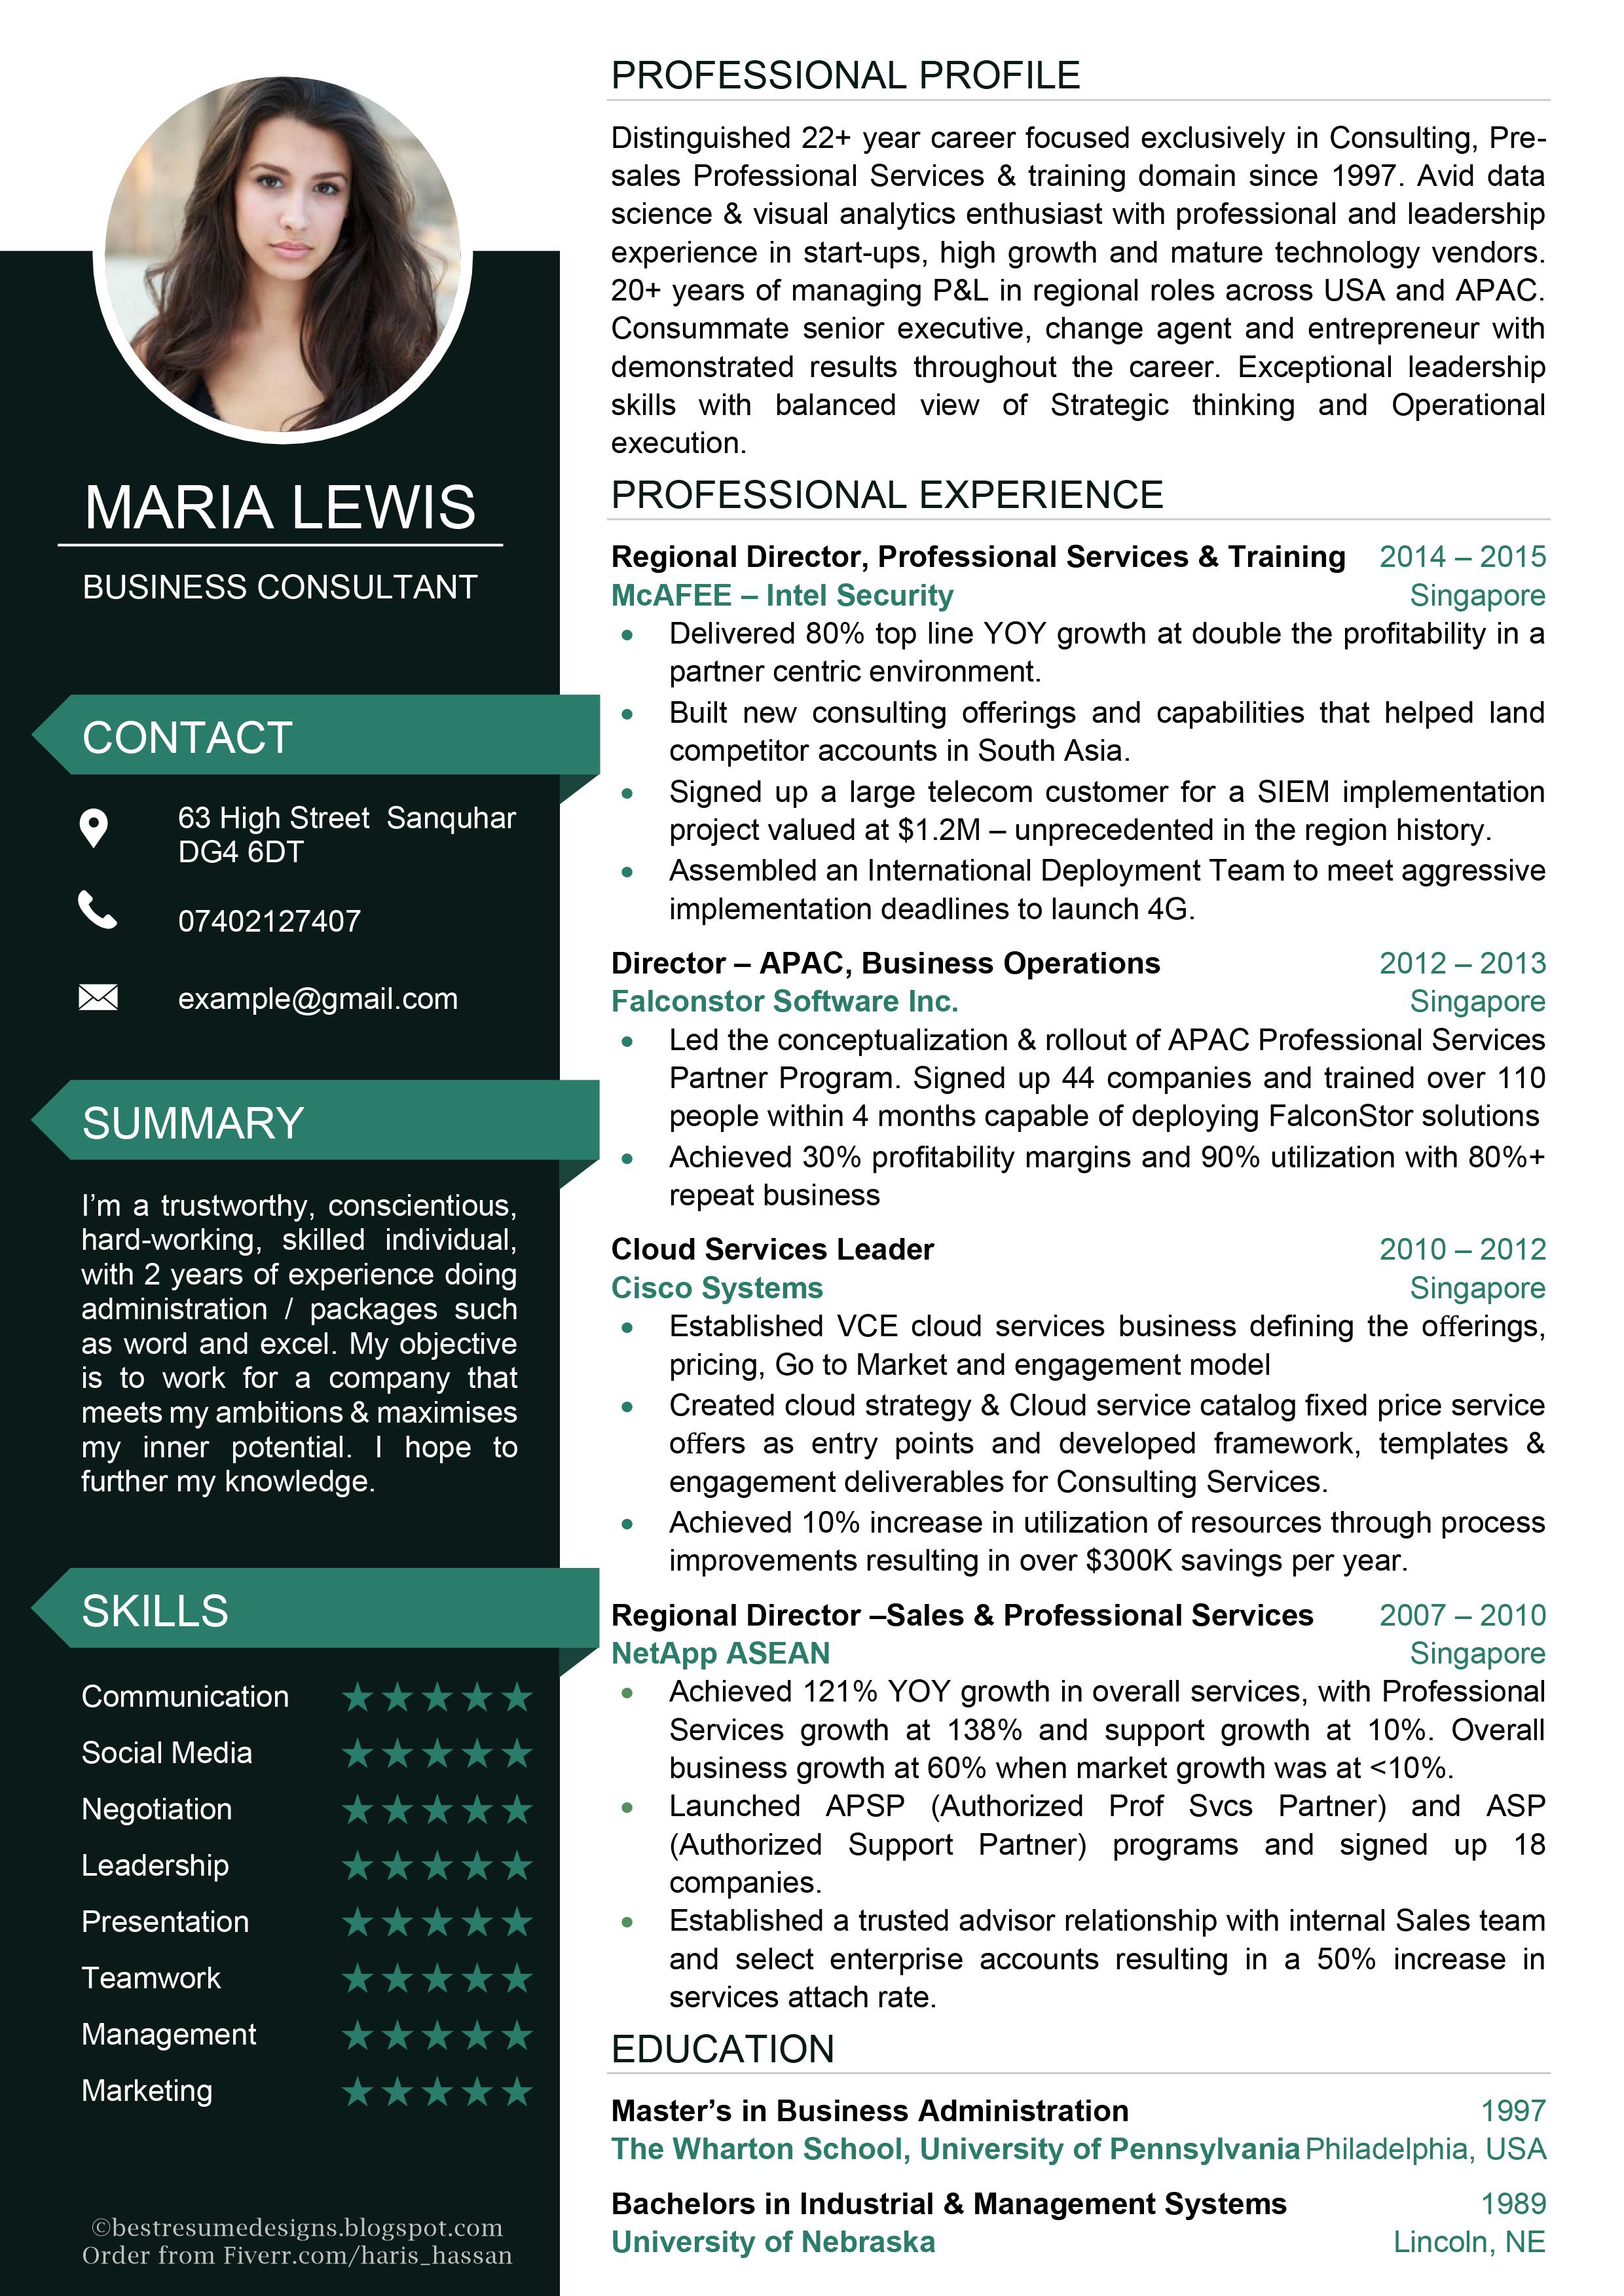 Cv Design No 26 Free Resume Template Word Resume Design Template Cv Design